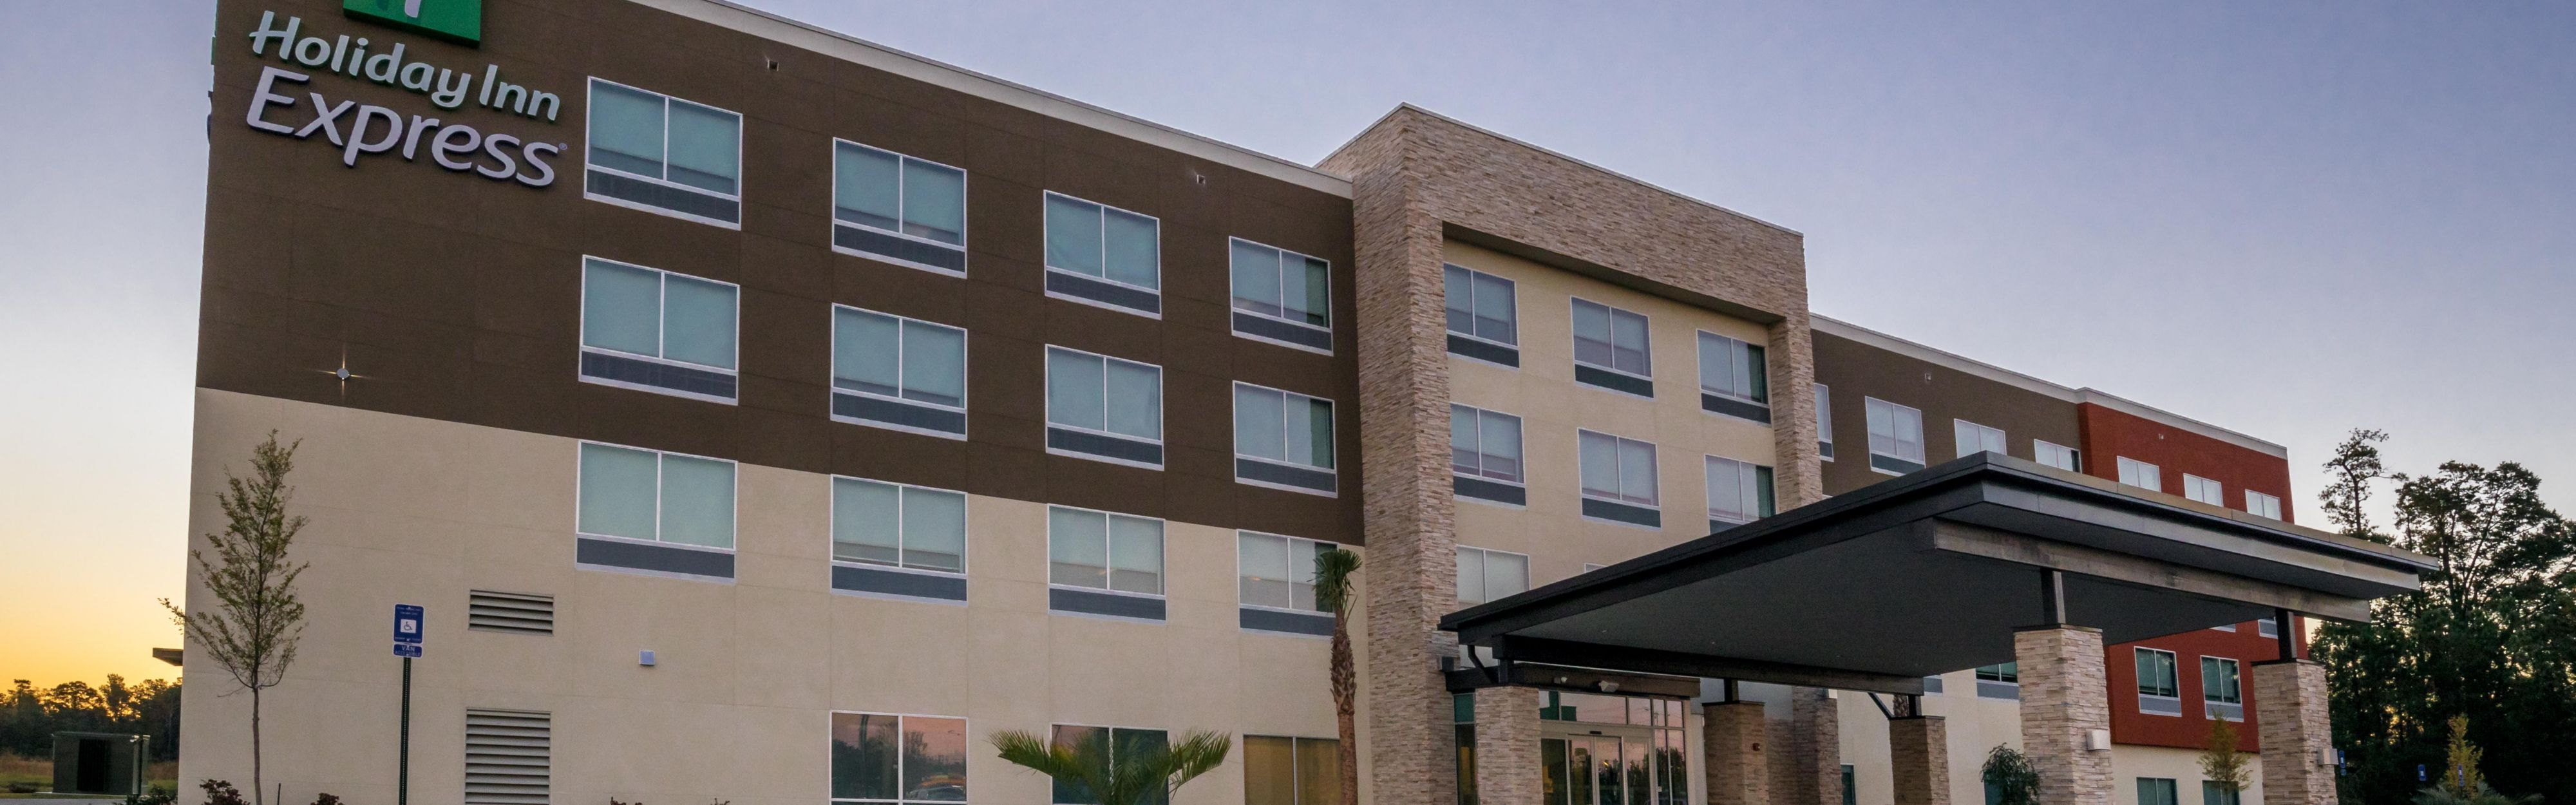 Holiday Inn Express North Augusta image 0